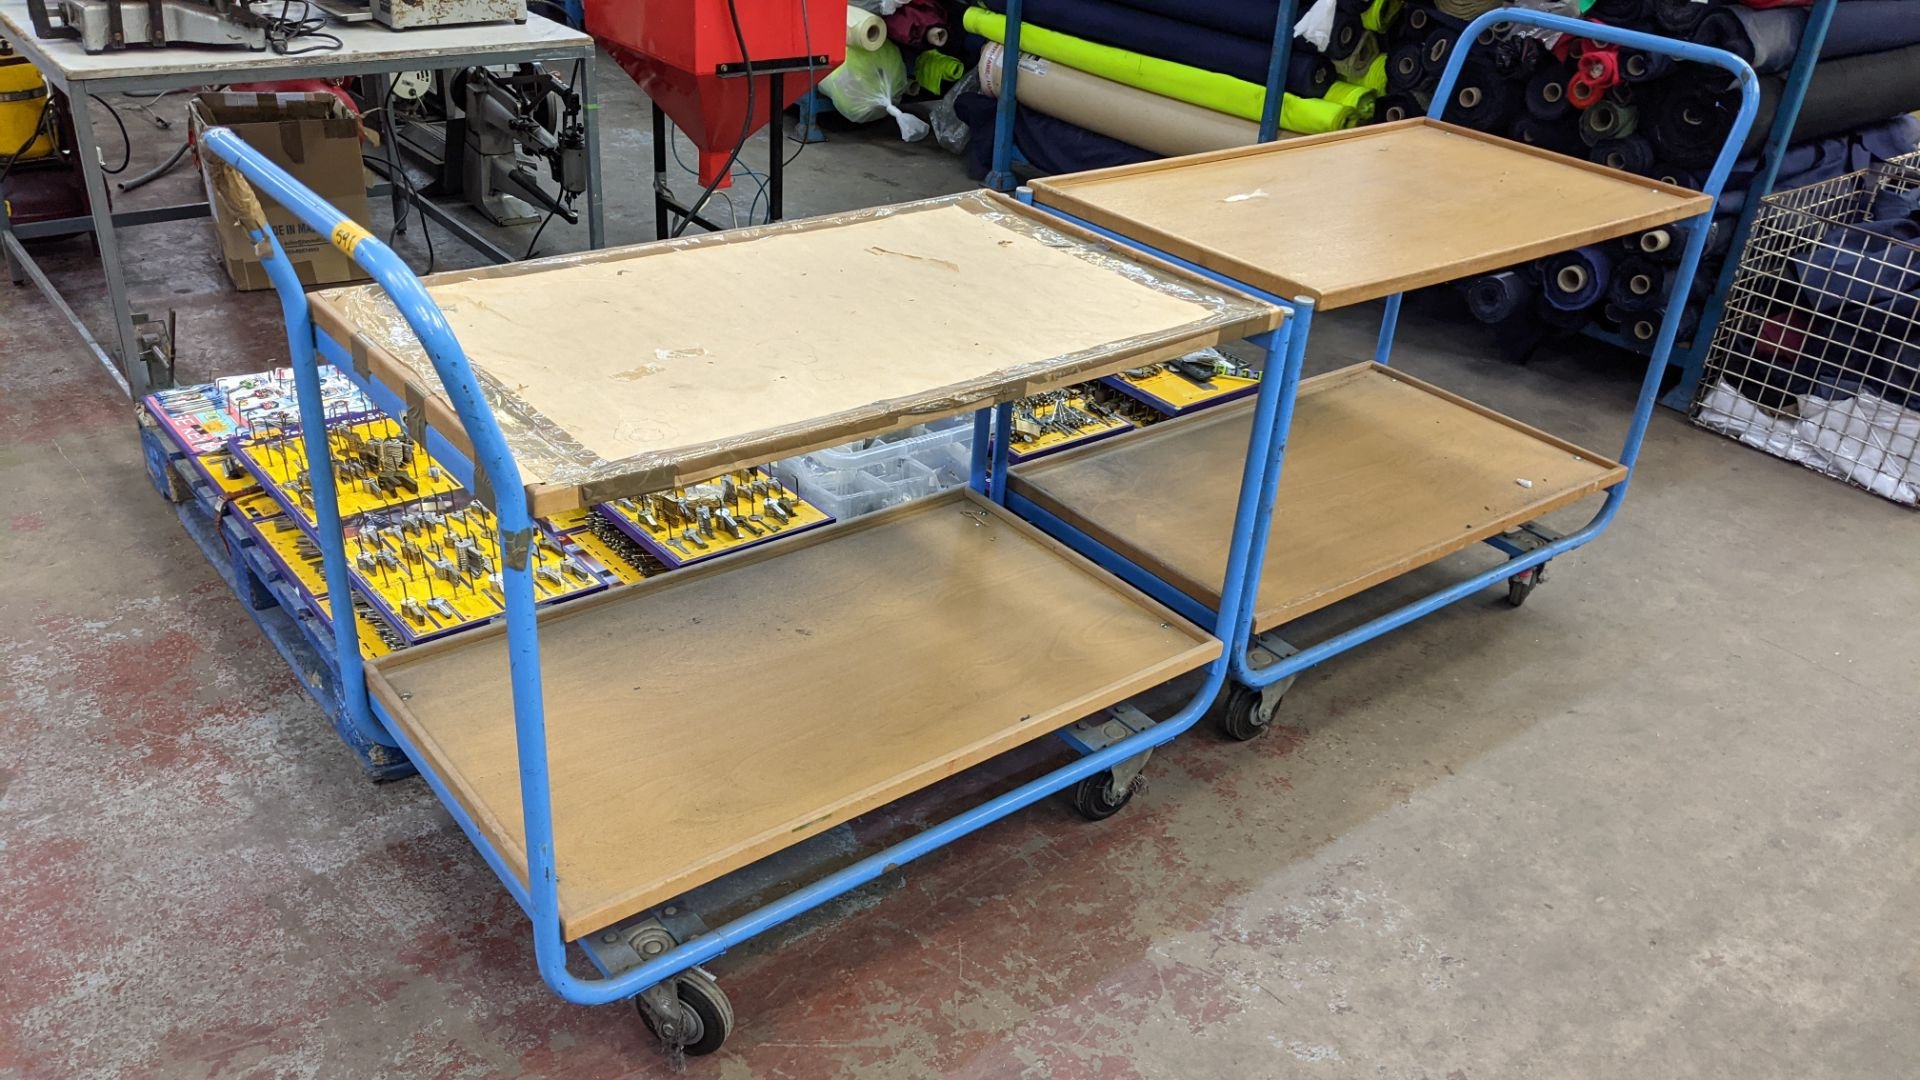 2 mobile twin shelf trolleys with lockable wheels - Image 6 of 7